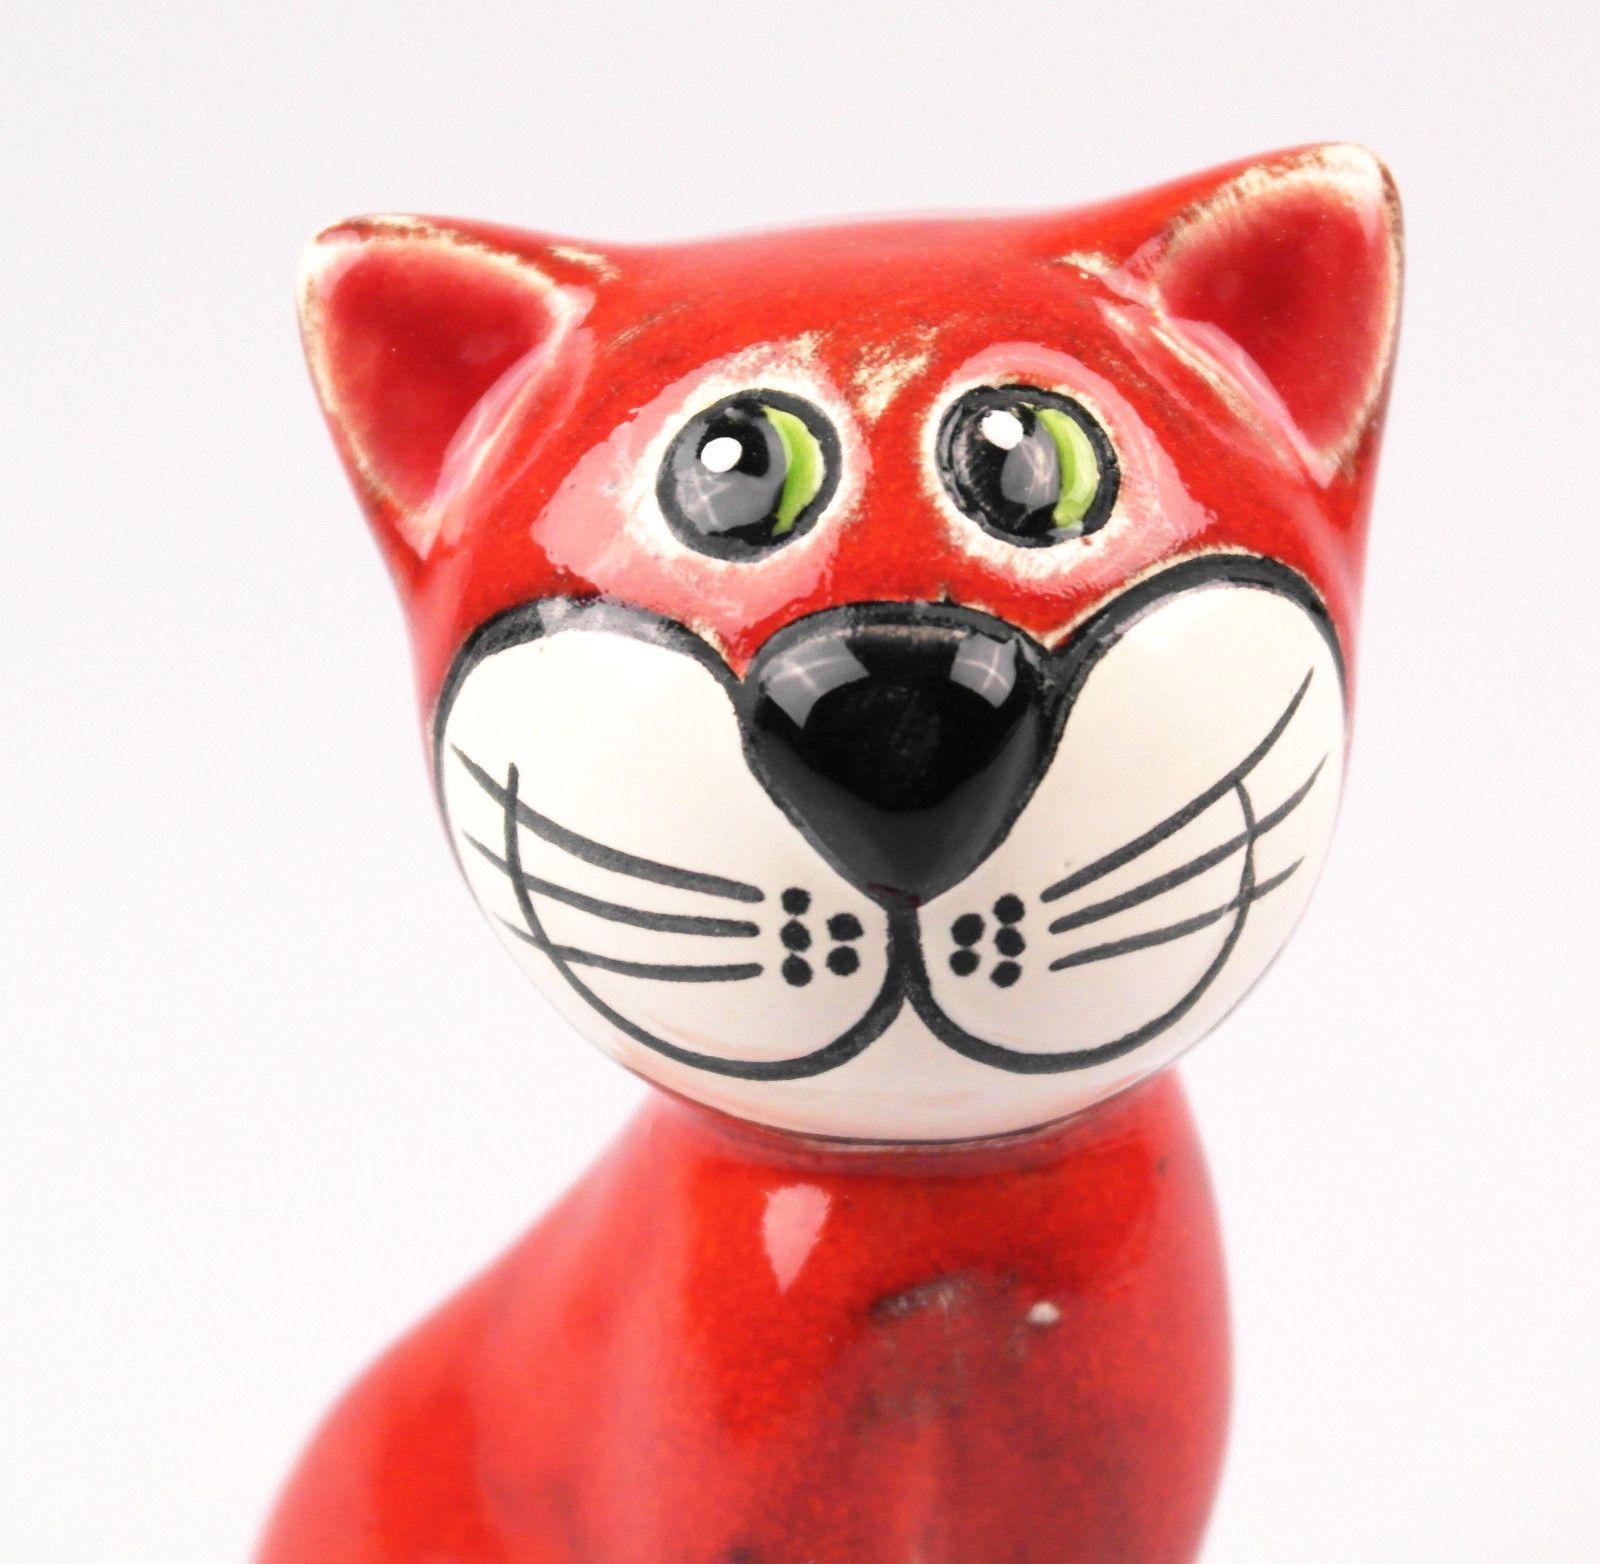 Katze sitzend rot 14 cm Keramik Figur reizende Deko für Heim